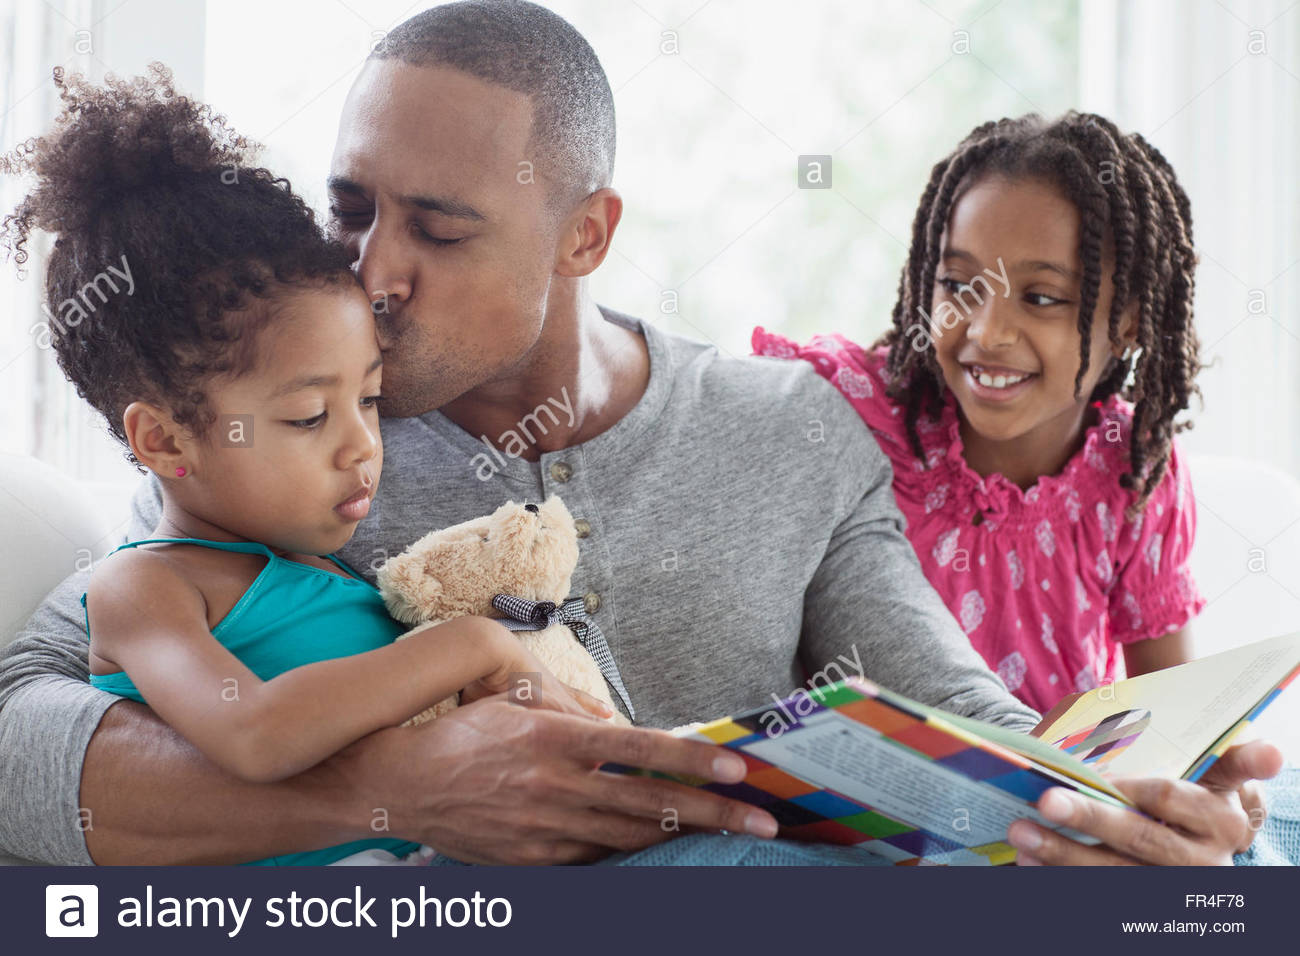 Papá besando a hija durante storytime Imagen De Stock